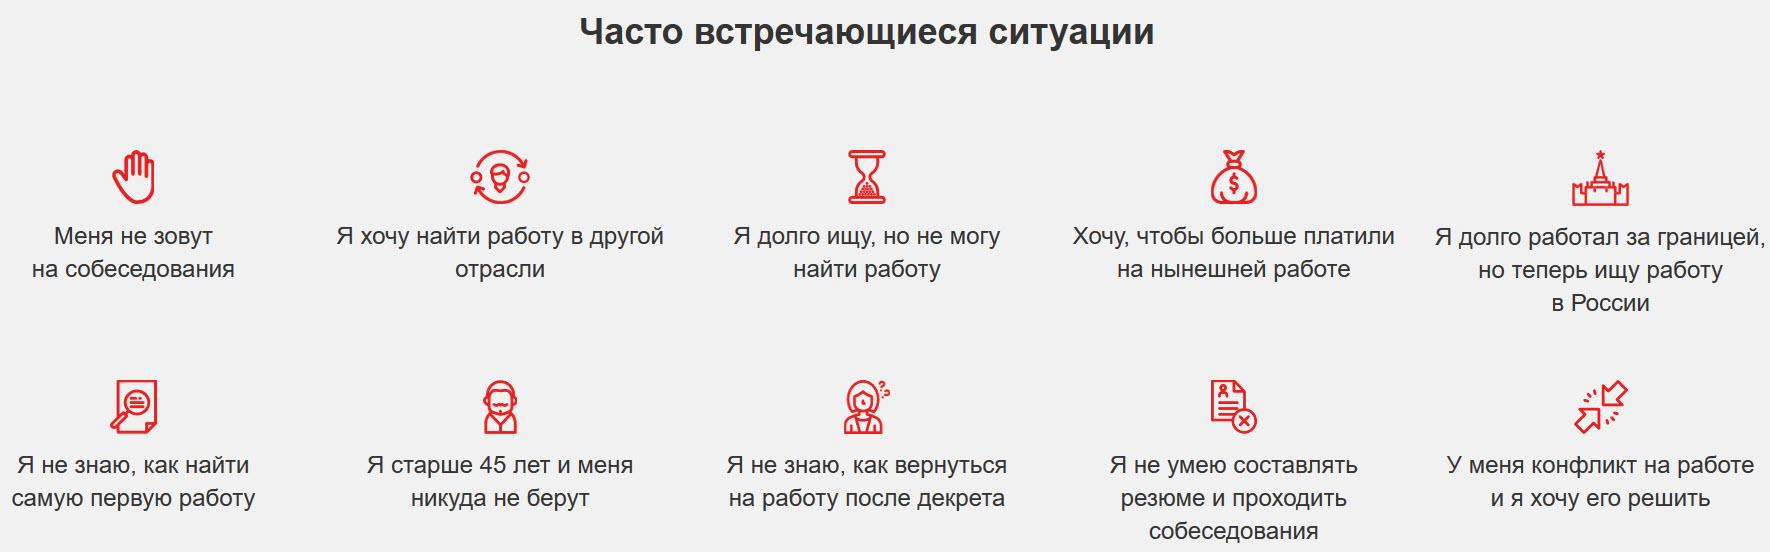 Скриншот с сайта consult.antirabstvo.ru